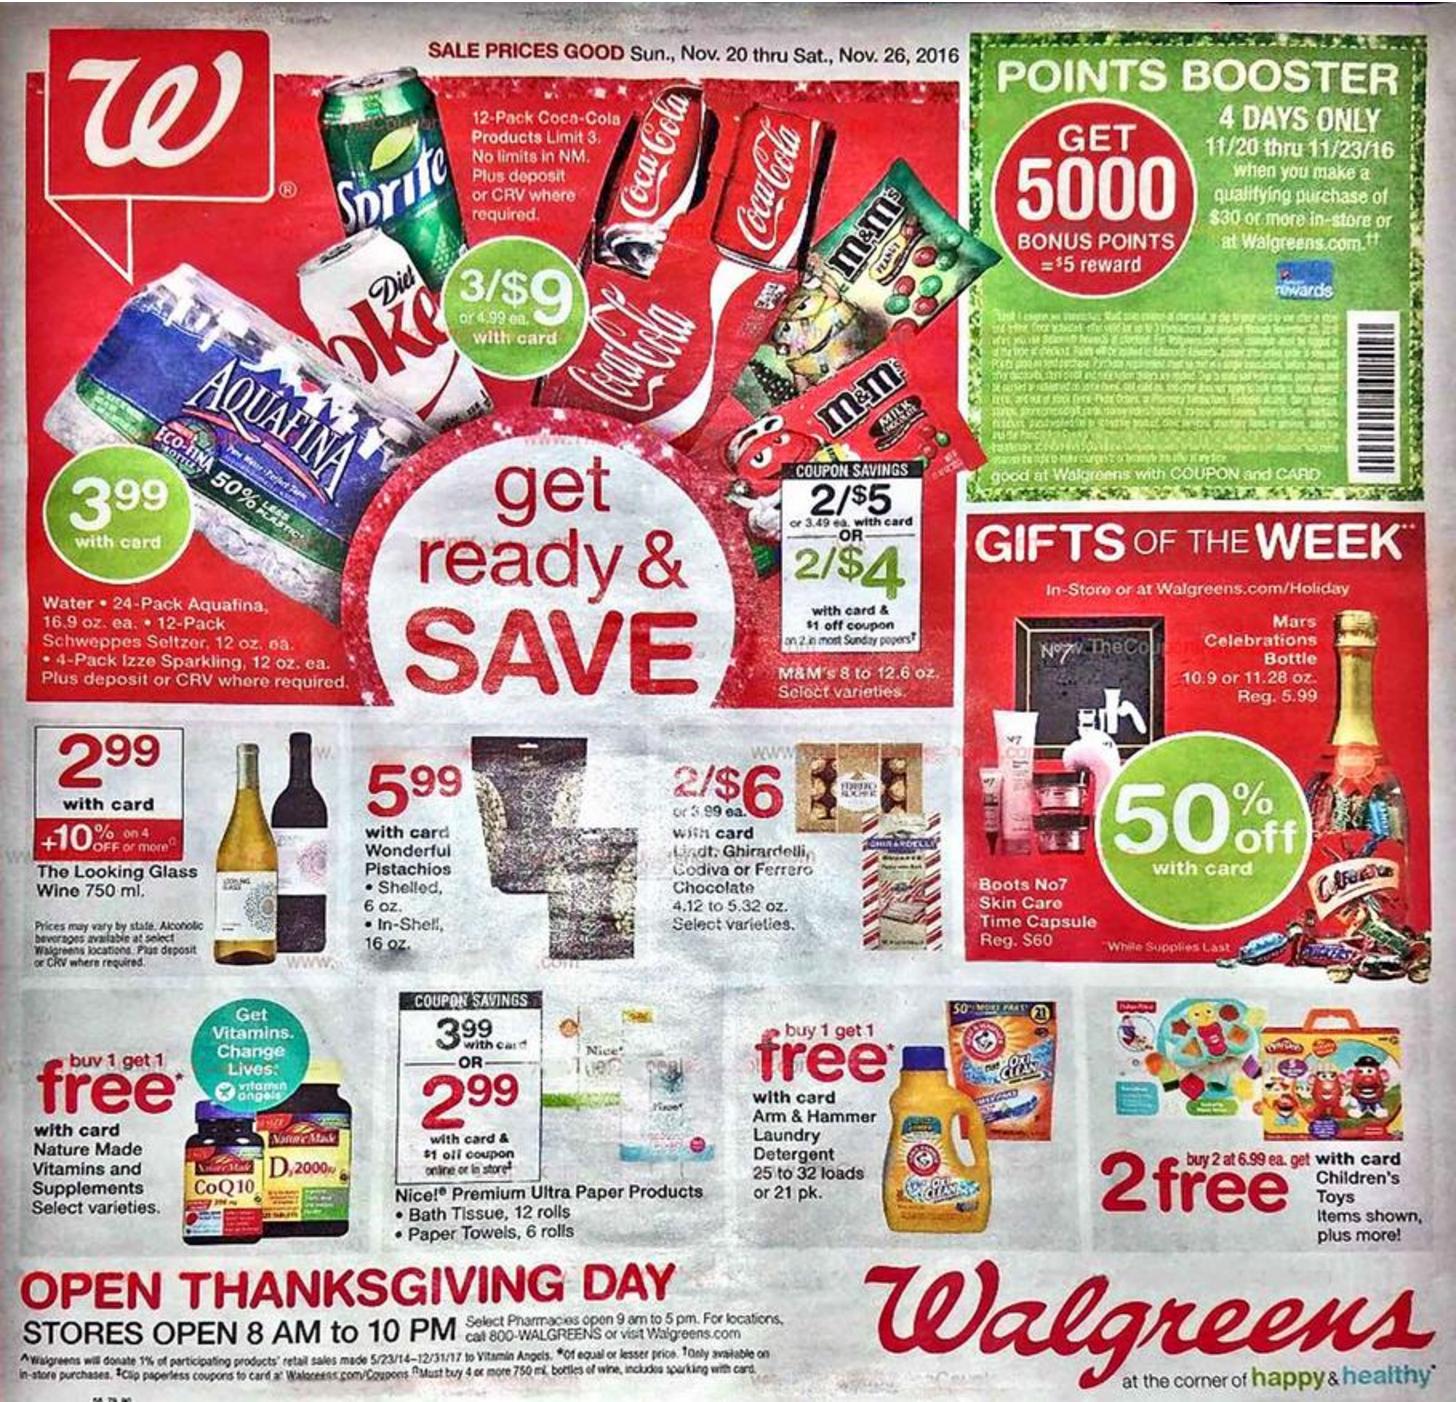 Walgreens Photo Christmas Cards Coupon. walgreens perfect coupon ...